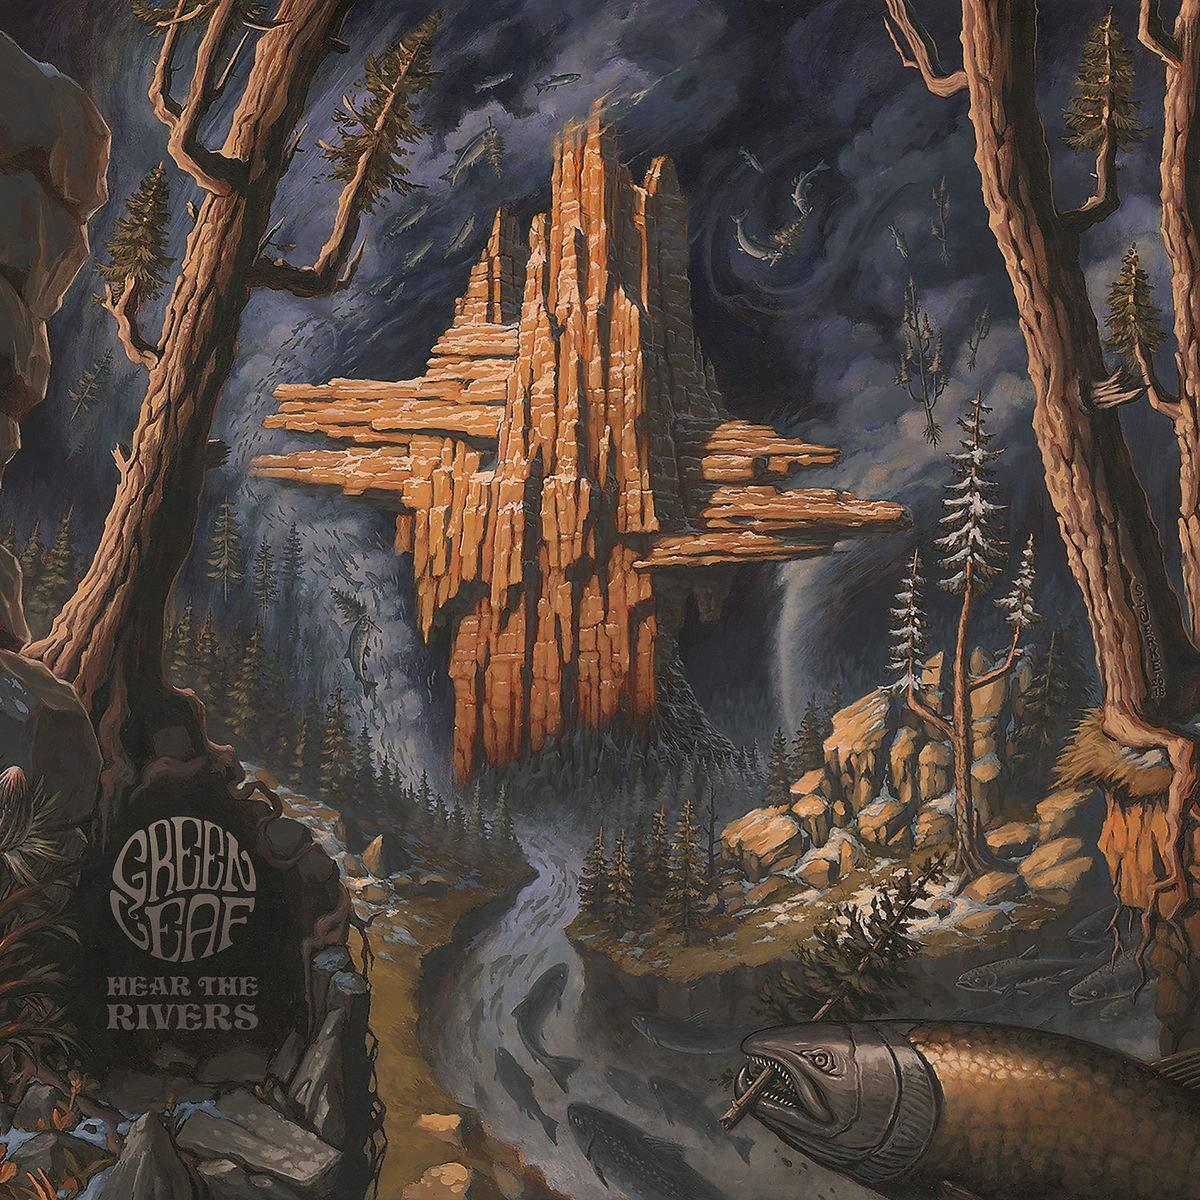 Greenleaf - Hear The Rivers